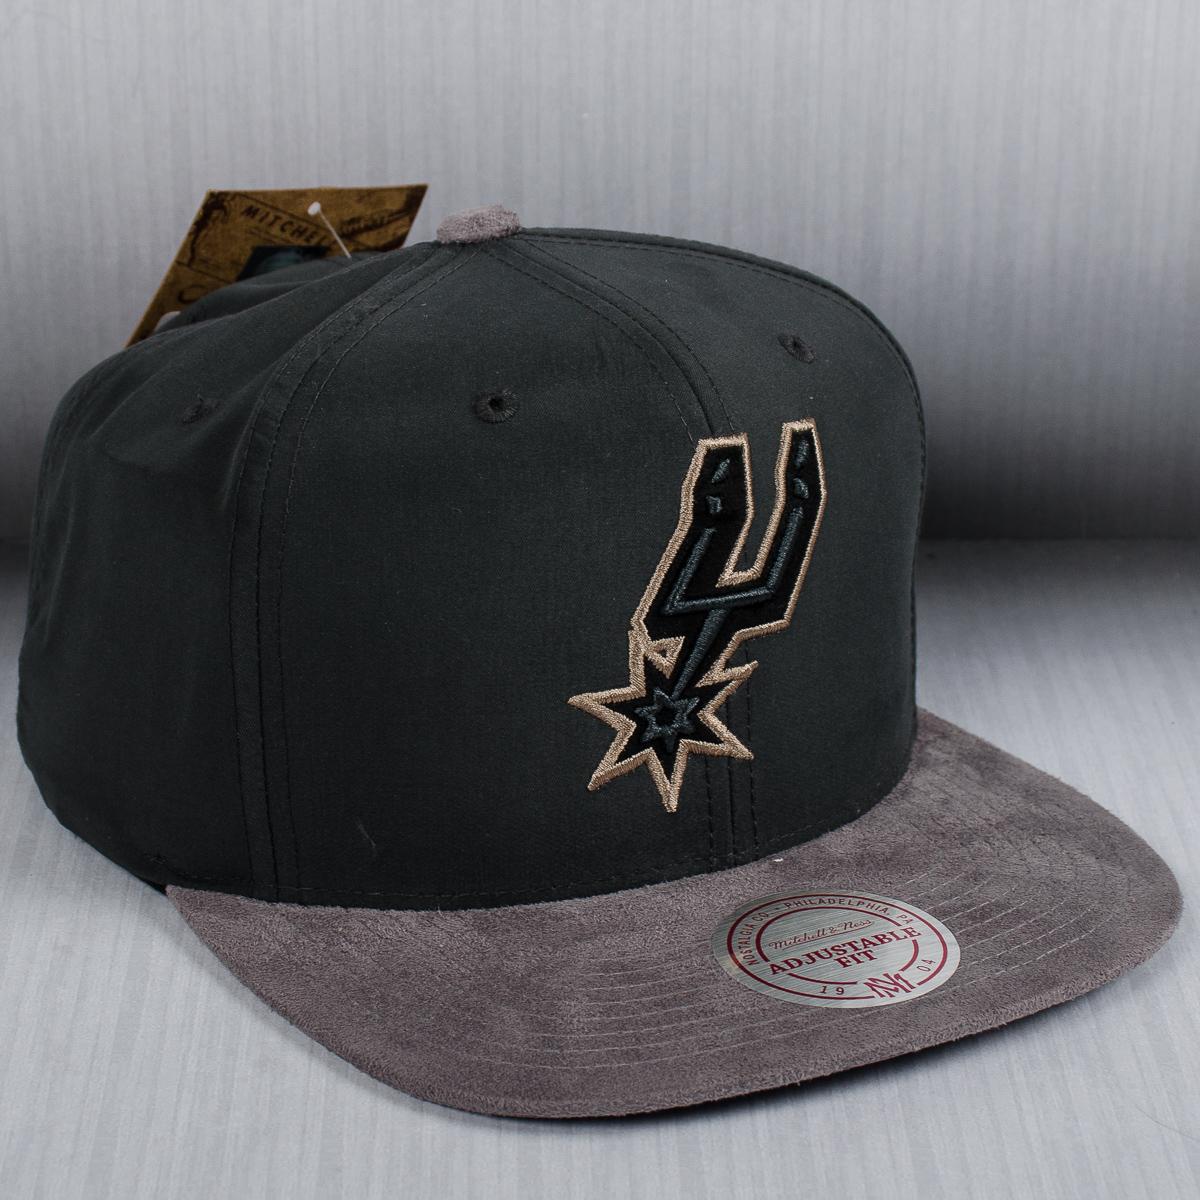 40f42ee7 Mitchell & Ness NBA San Antonio Spurs Buttery Snapback Cap - NBA ...